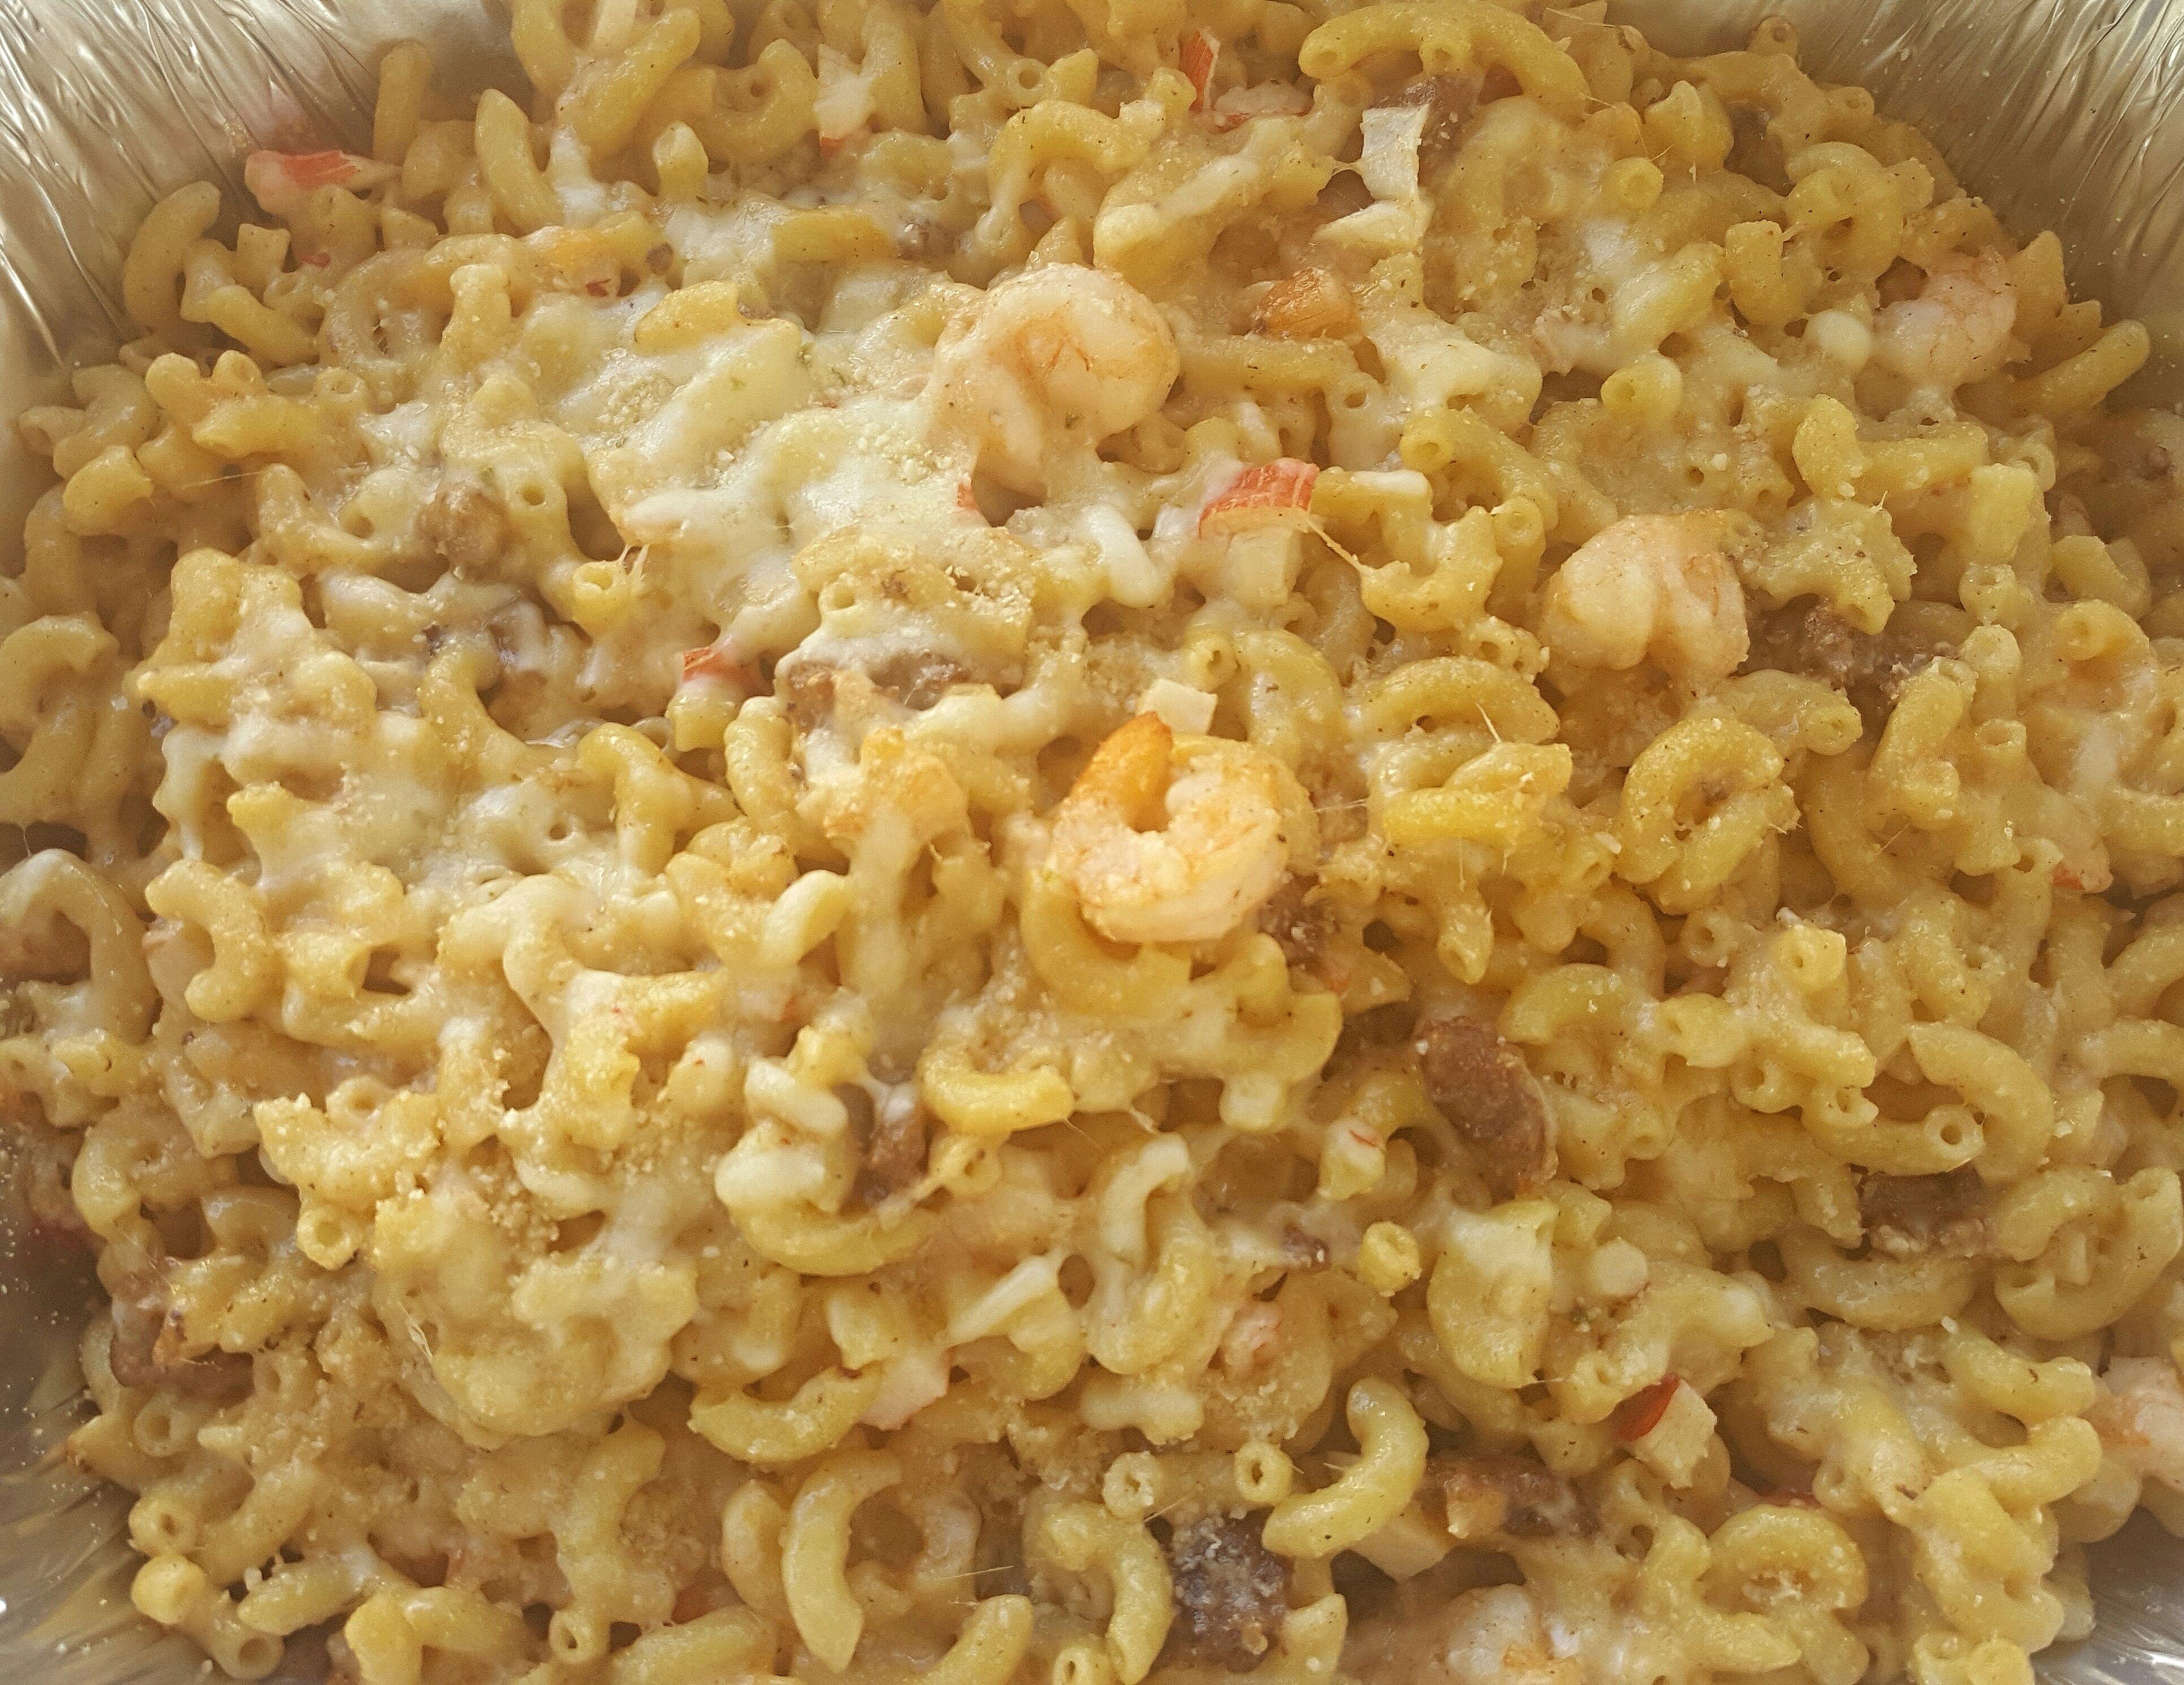 [Homemade] Cajun seafood and sausage mac-n-cheese